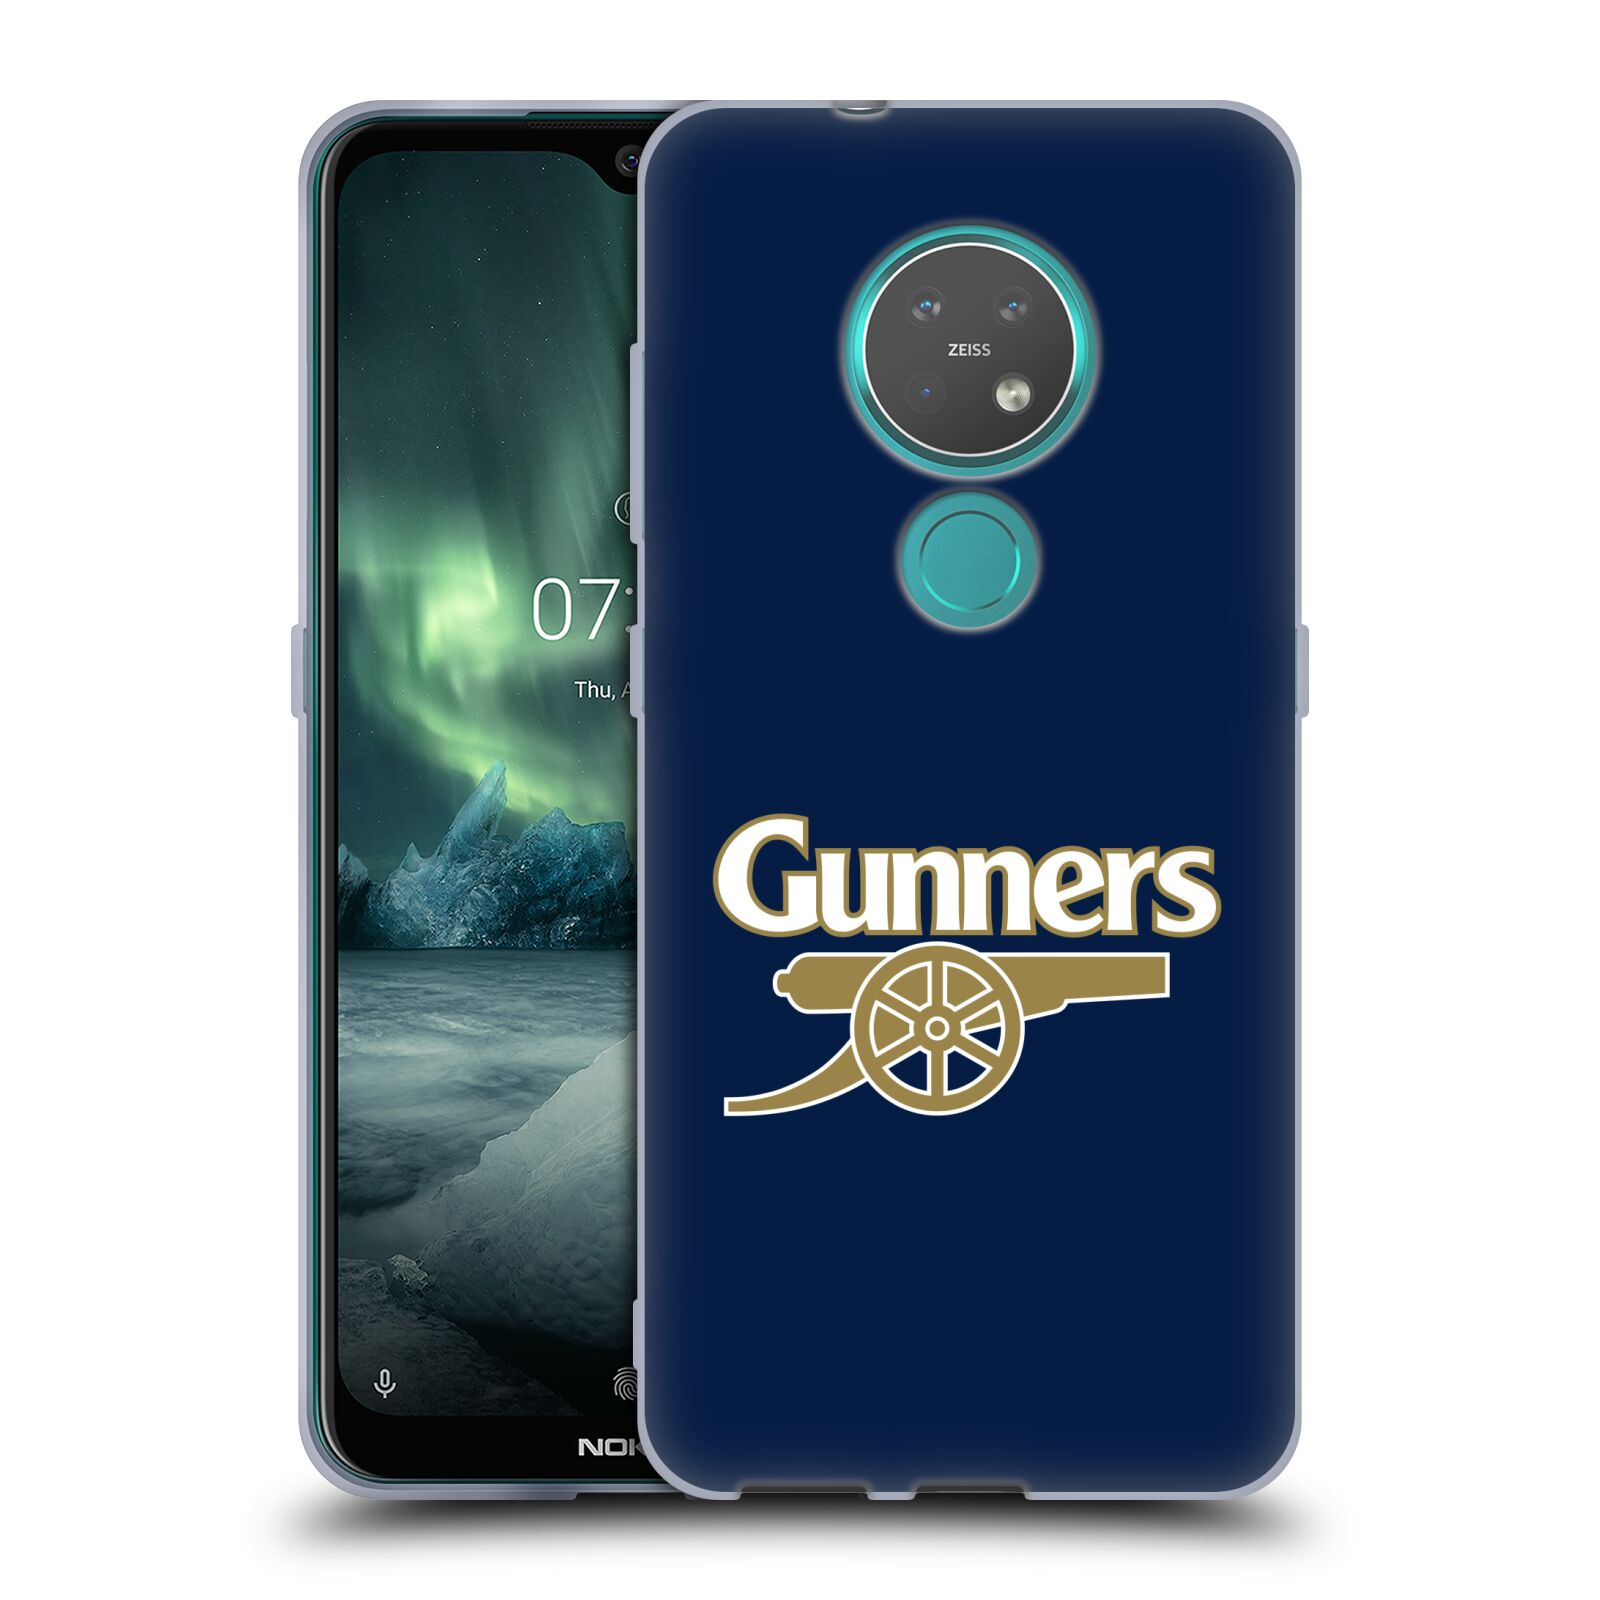 Silikonové pouzdro na mobil Nokia 7.2 - Head Case - Arsenal FC - Gunners